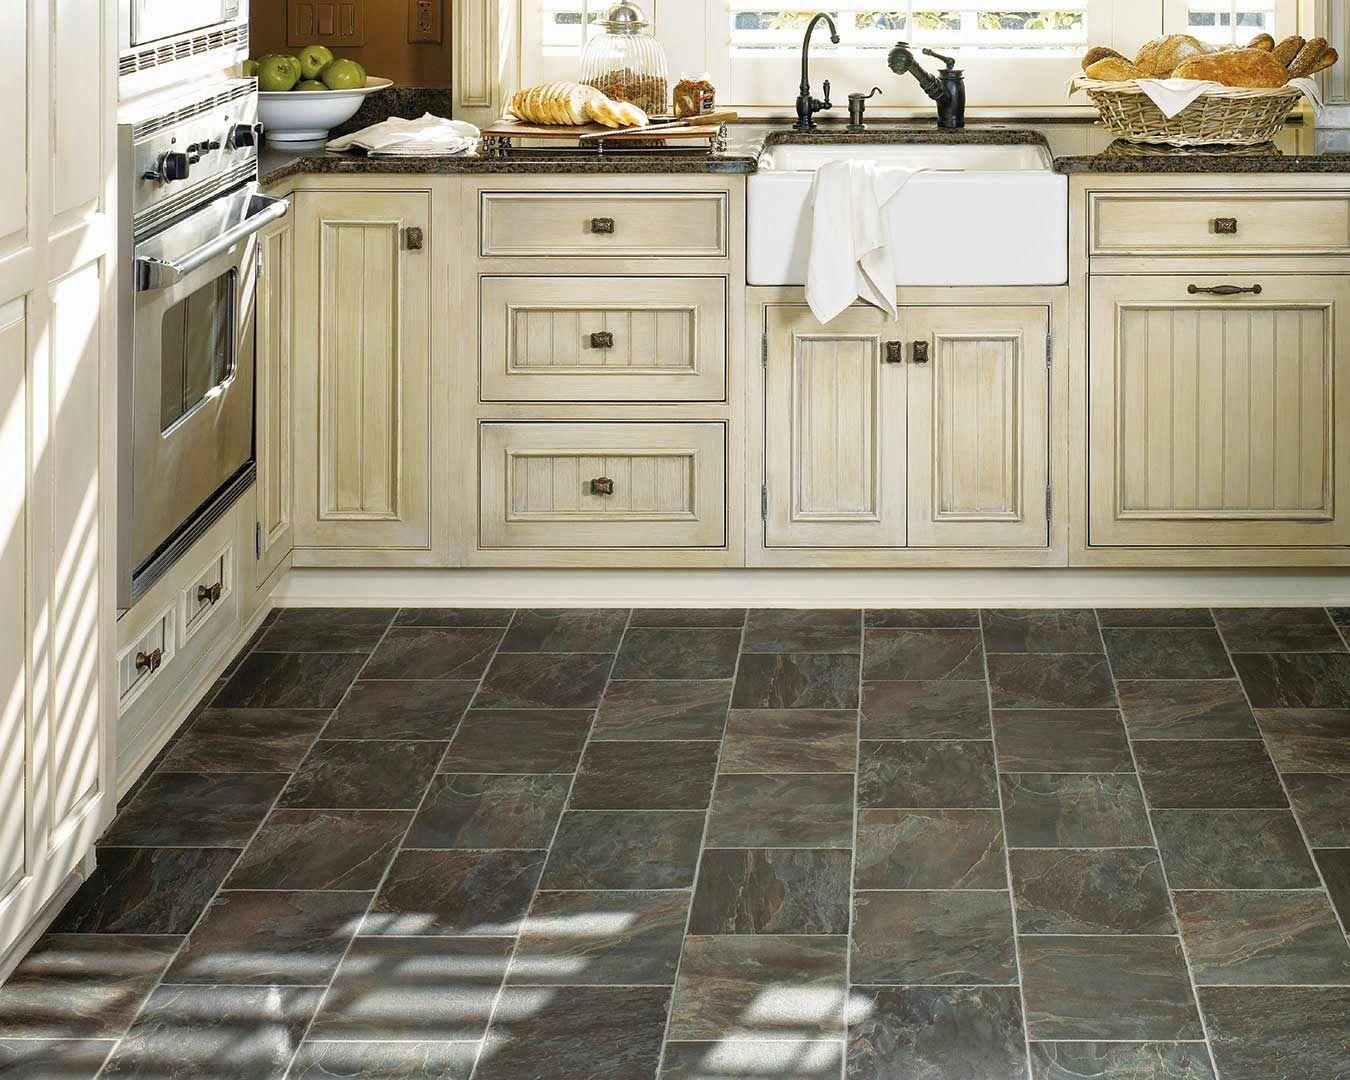 kitchen flooring types pickled oak cabinets dark floors Best Black Vinyl Sheet Flooring For Small Kitchen With Old